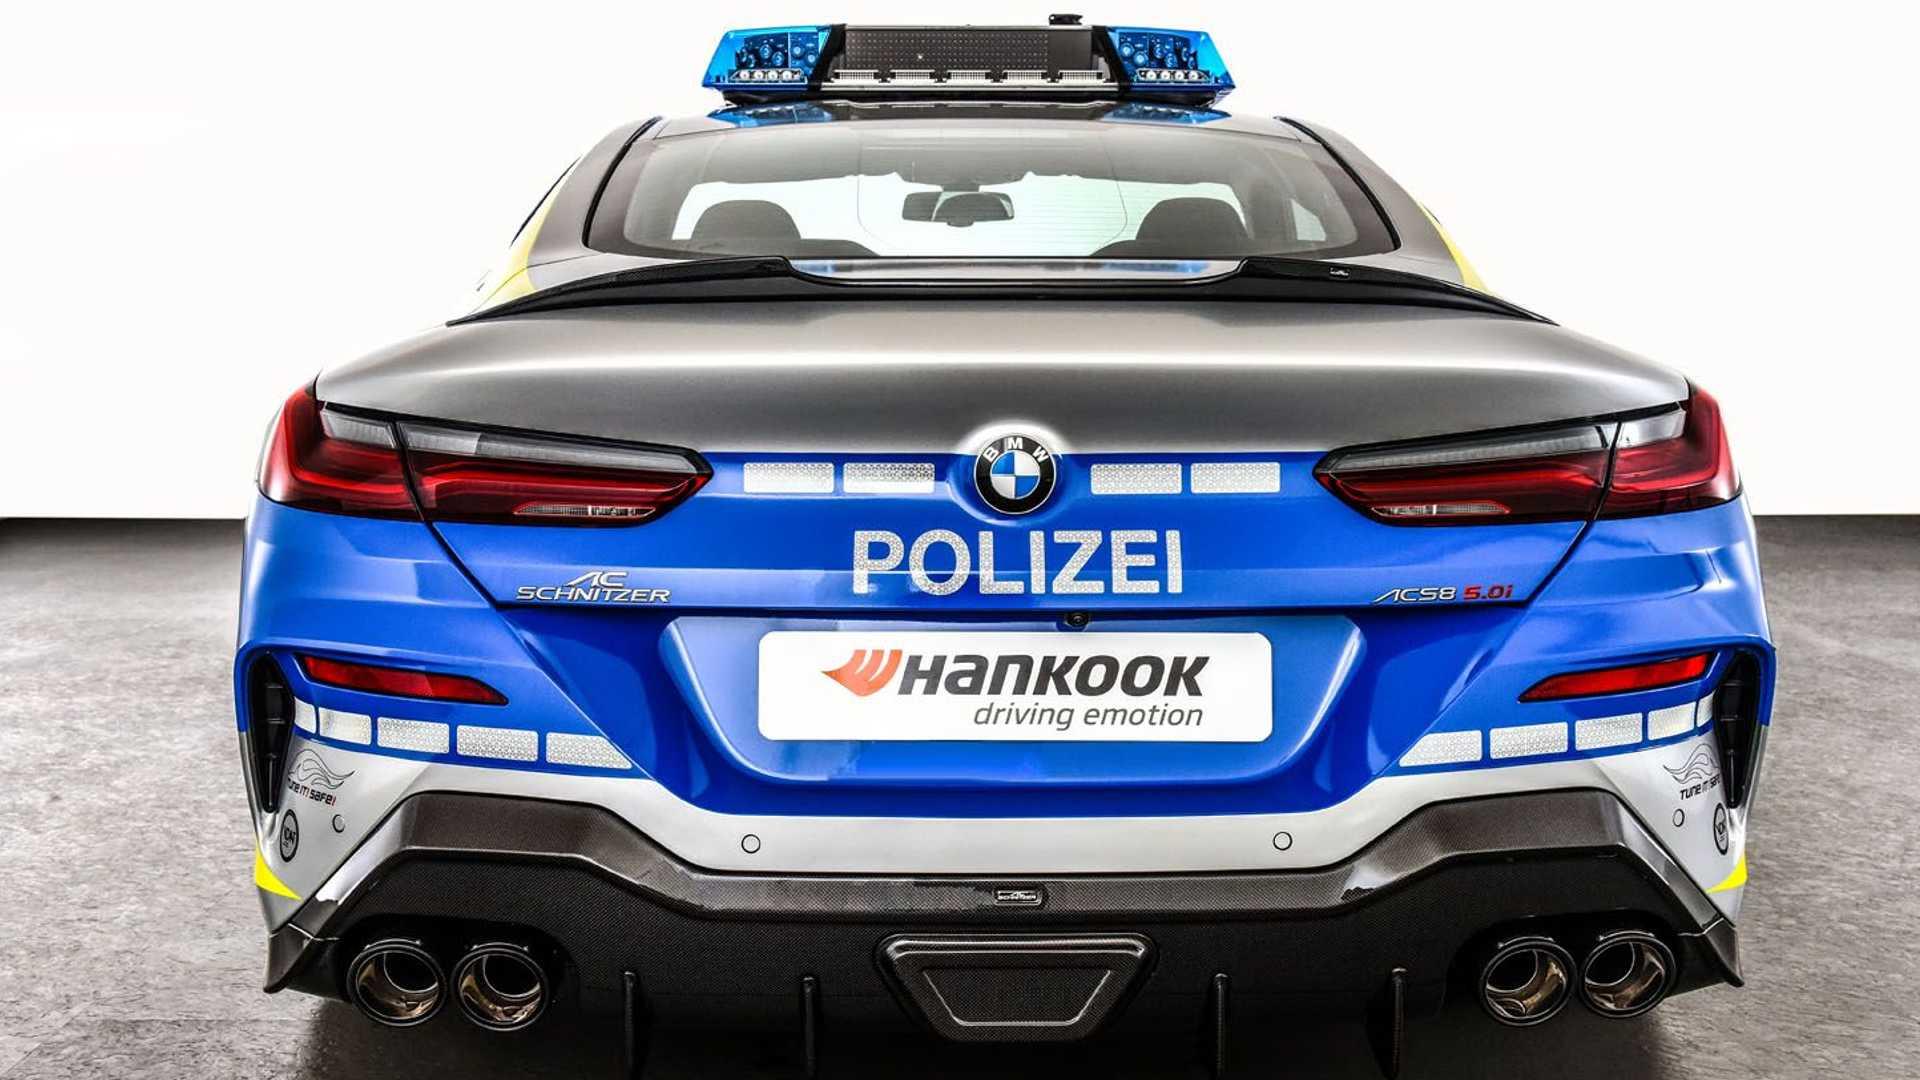 BMW-M850i-police-car-tune-it-safe-32